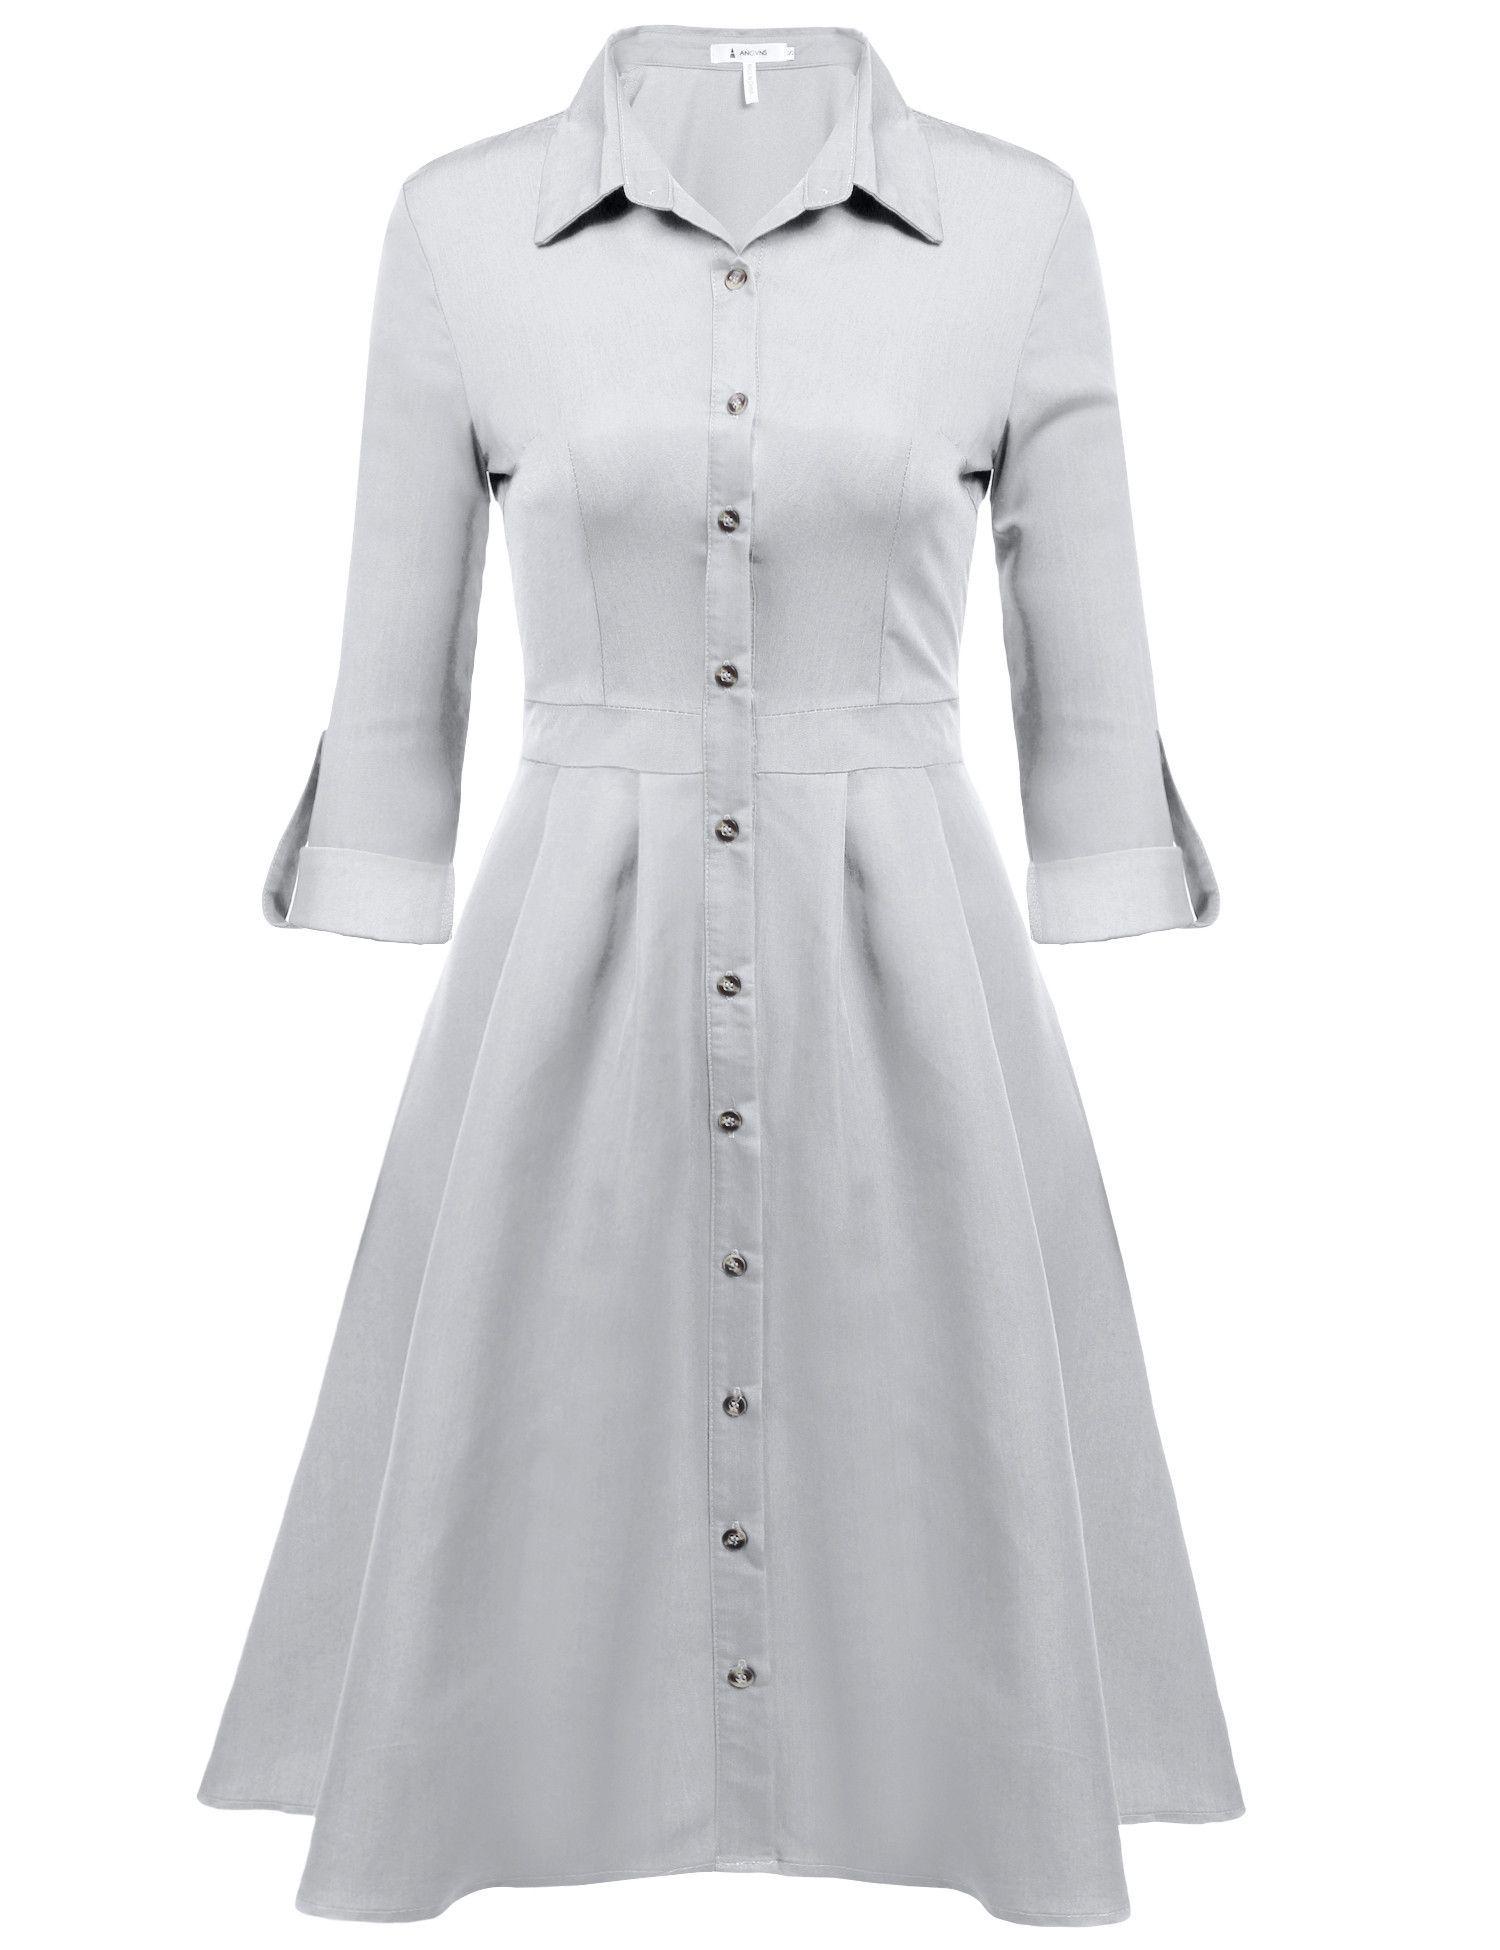 Women casual long sleeve solid buttondown collar tunic swing dress